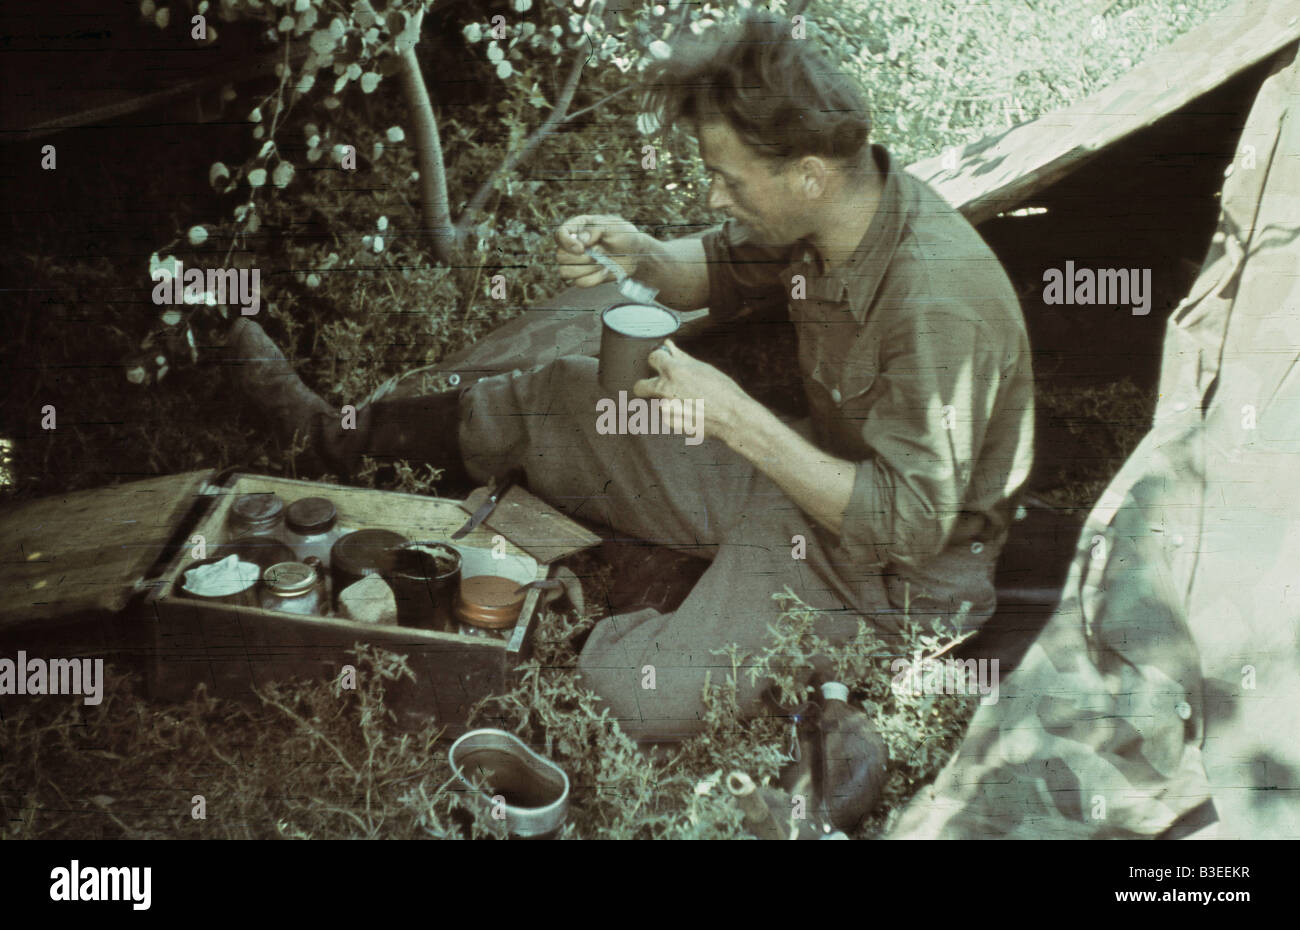 Soldier having breakfast / WWII / 1941 - Stock Image